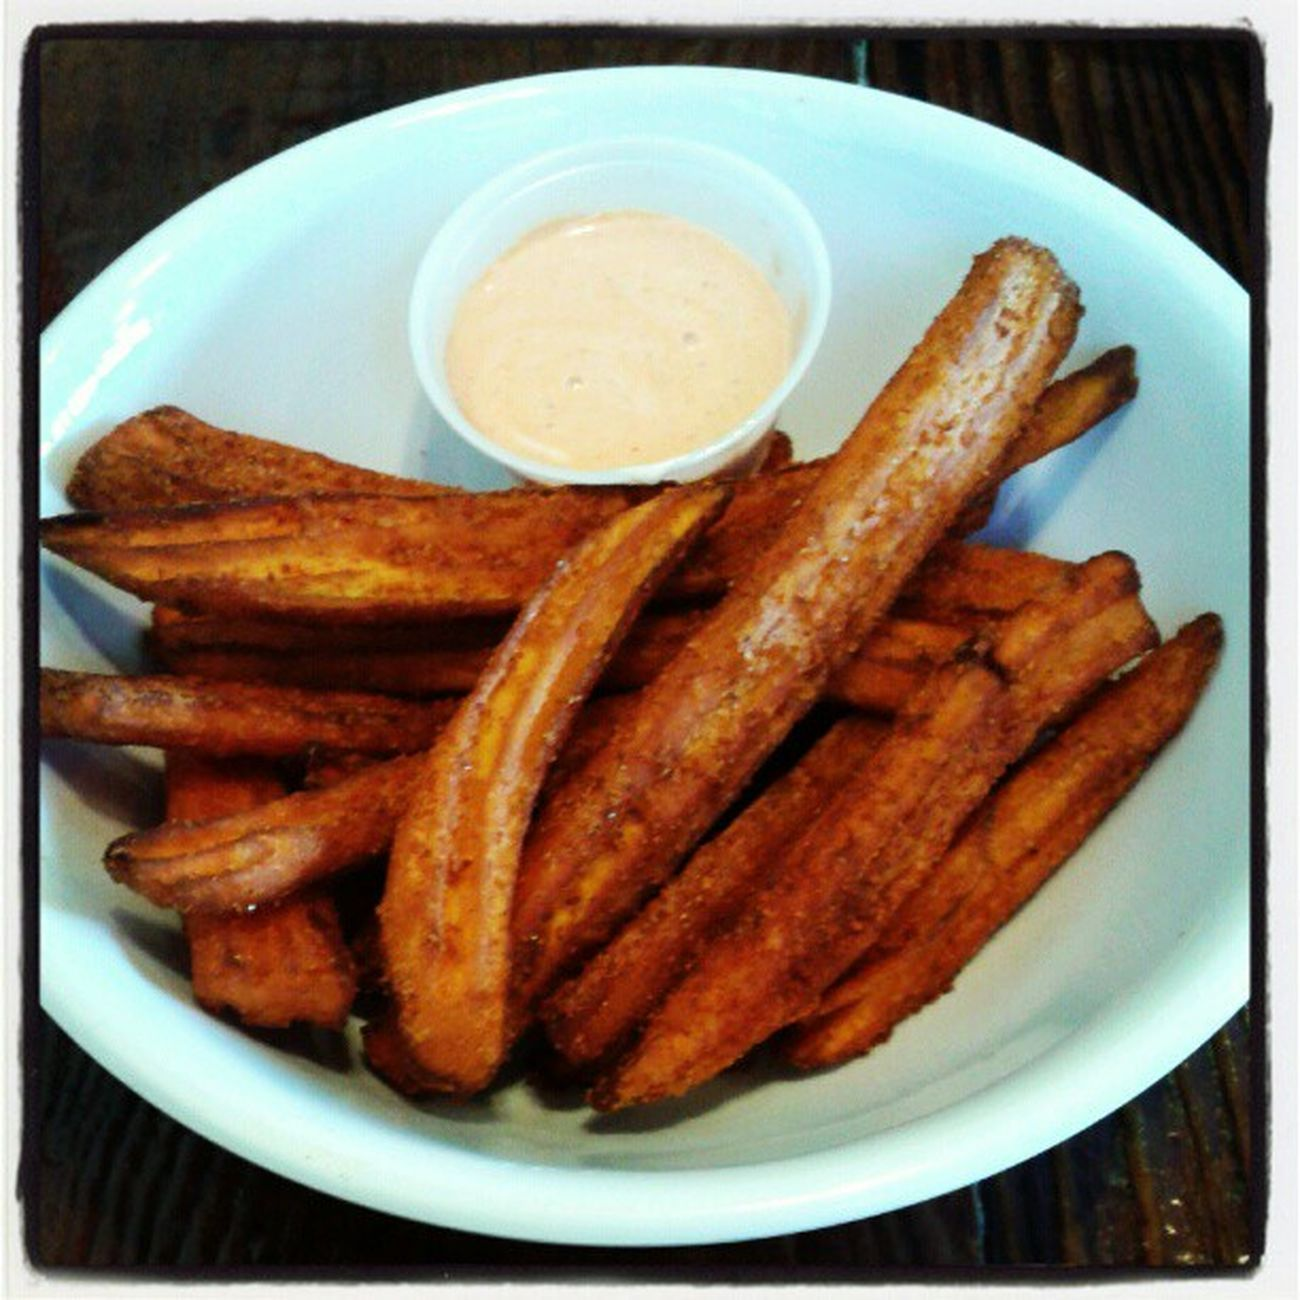 Chile limón sweet potato fries with ranch sriacha sauce! (a la Bushfiregrill )